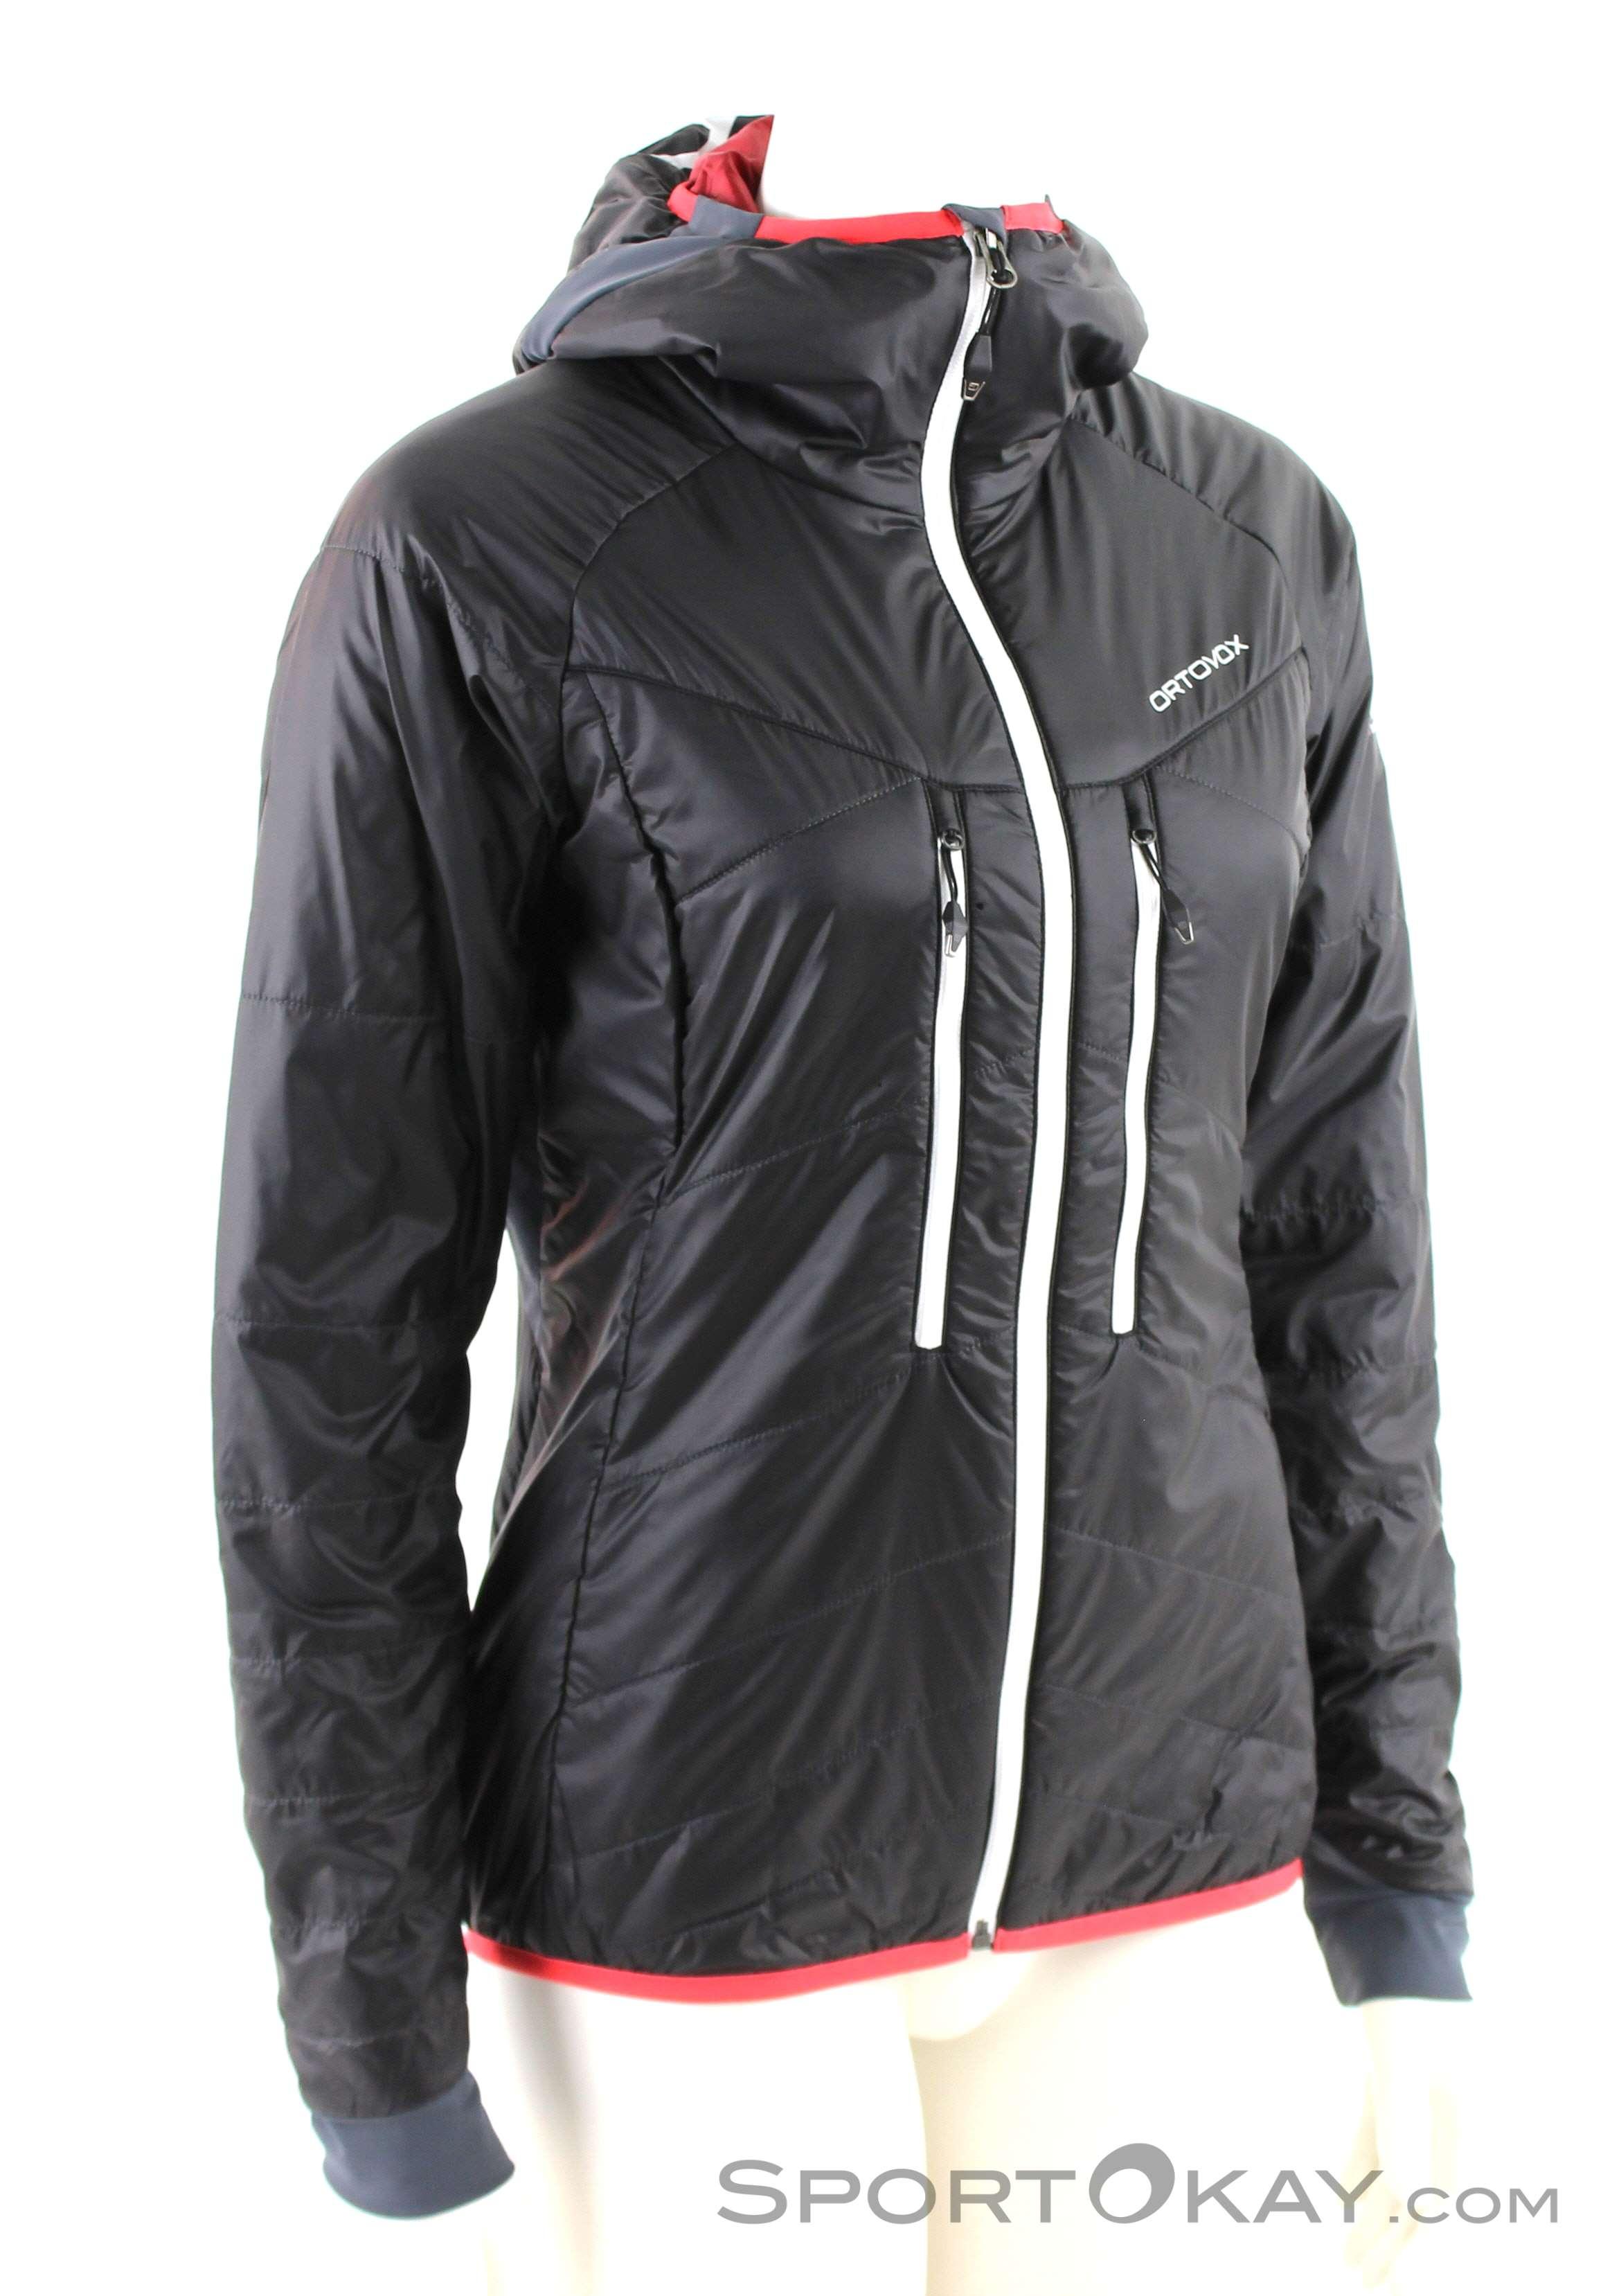 Damen Jacket Ortovox Tourenjacke Lavarella Jacken gY6f7by